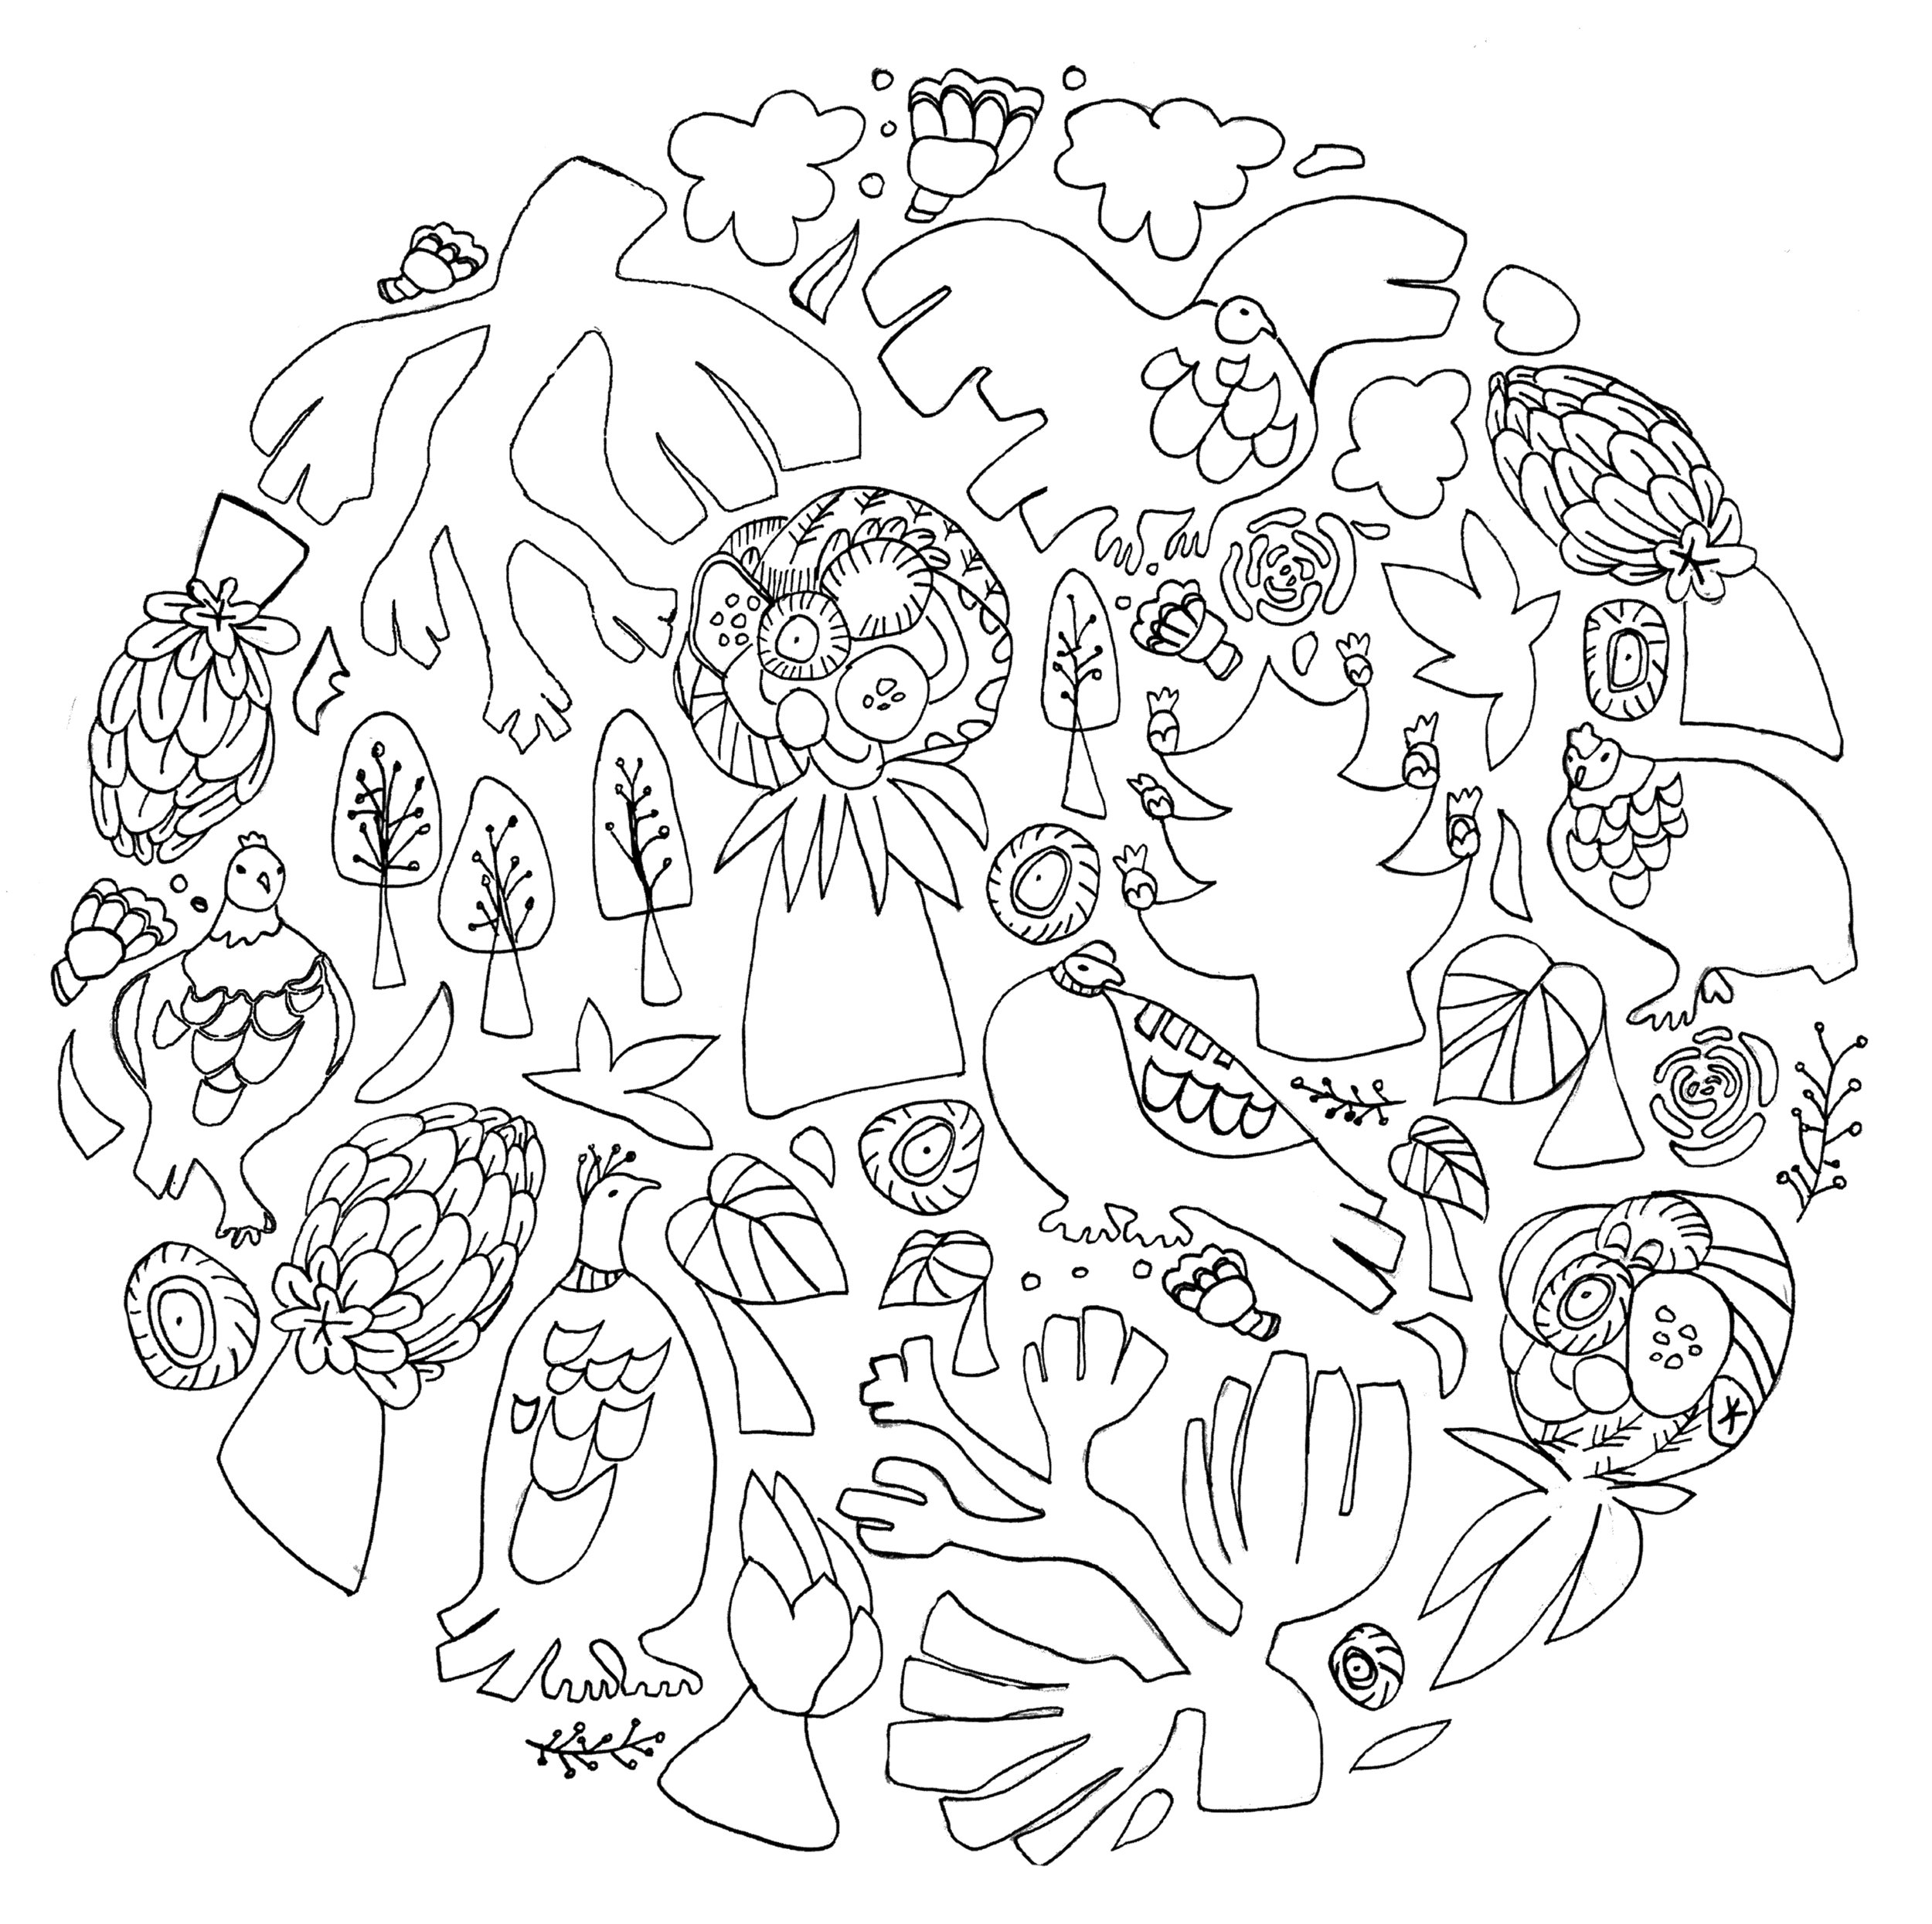 Porcelain-forest-1.jpg